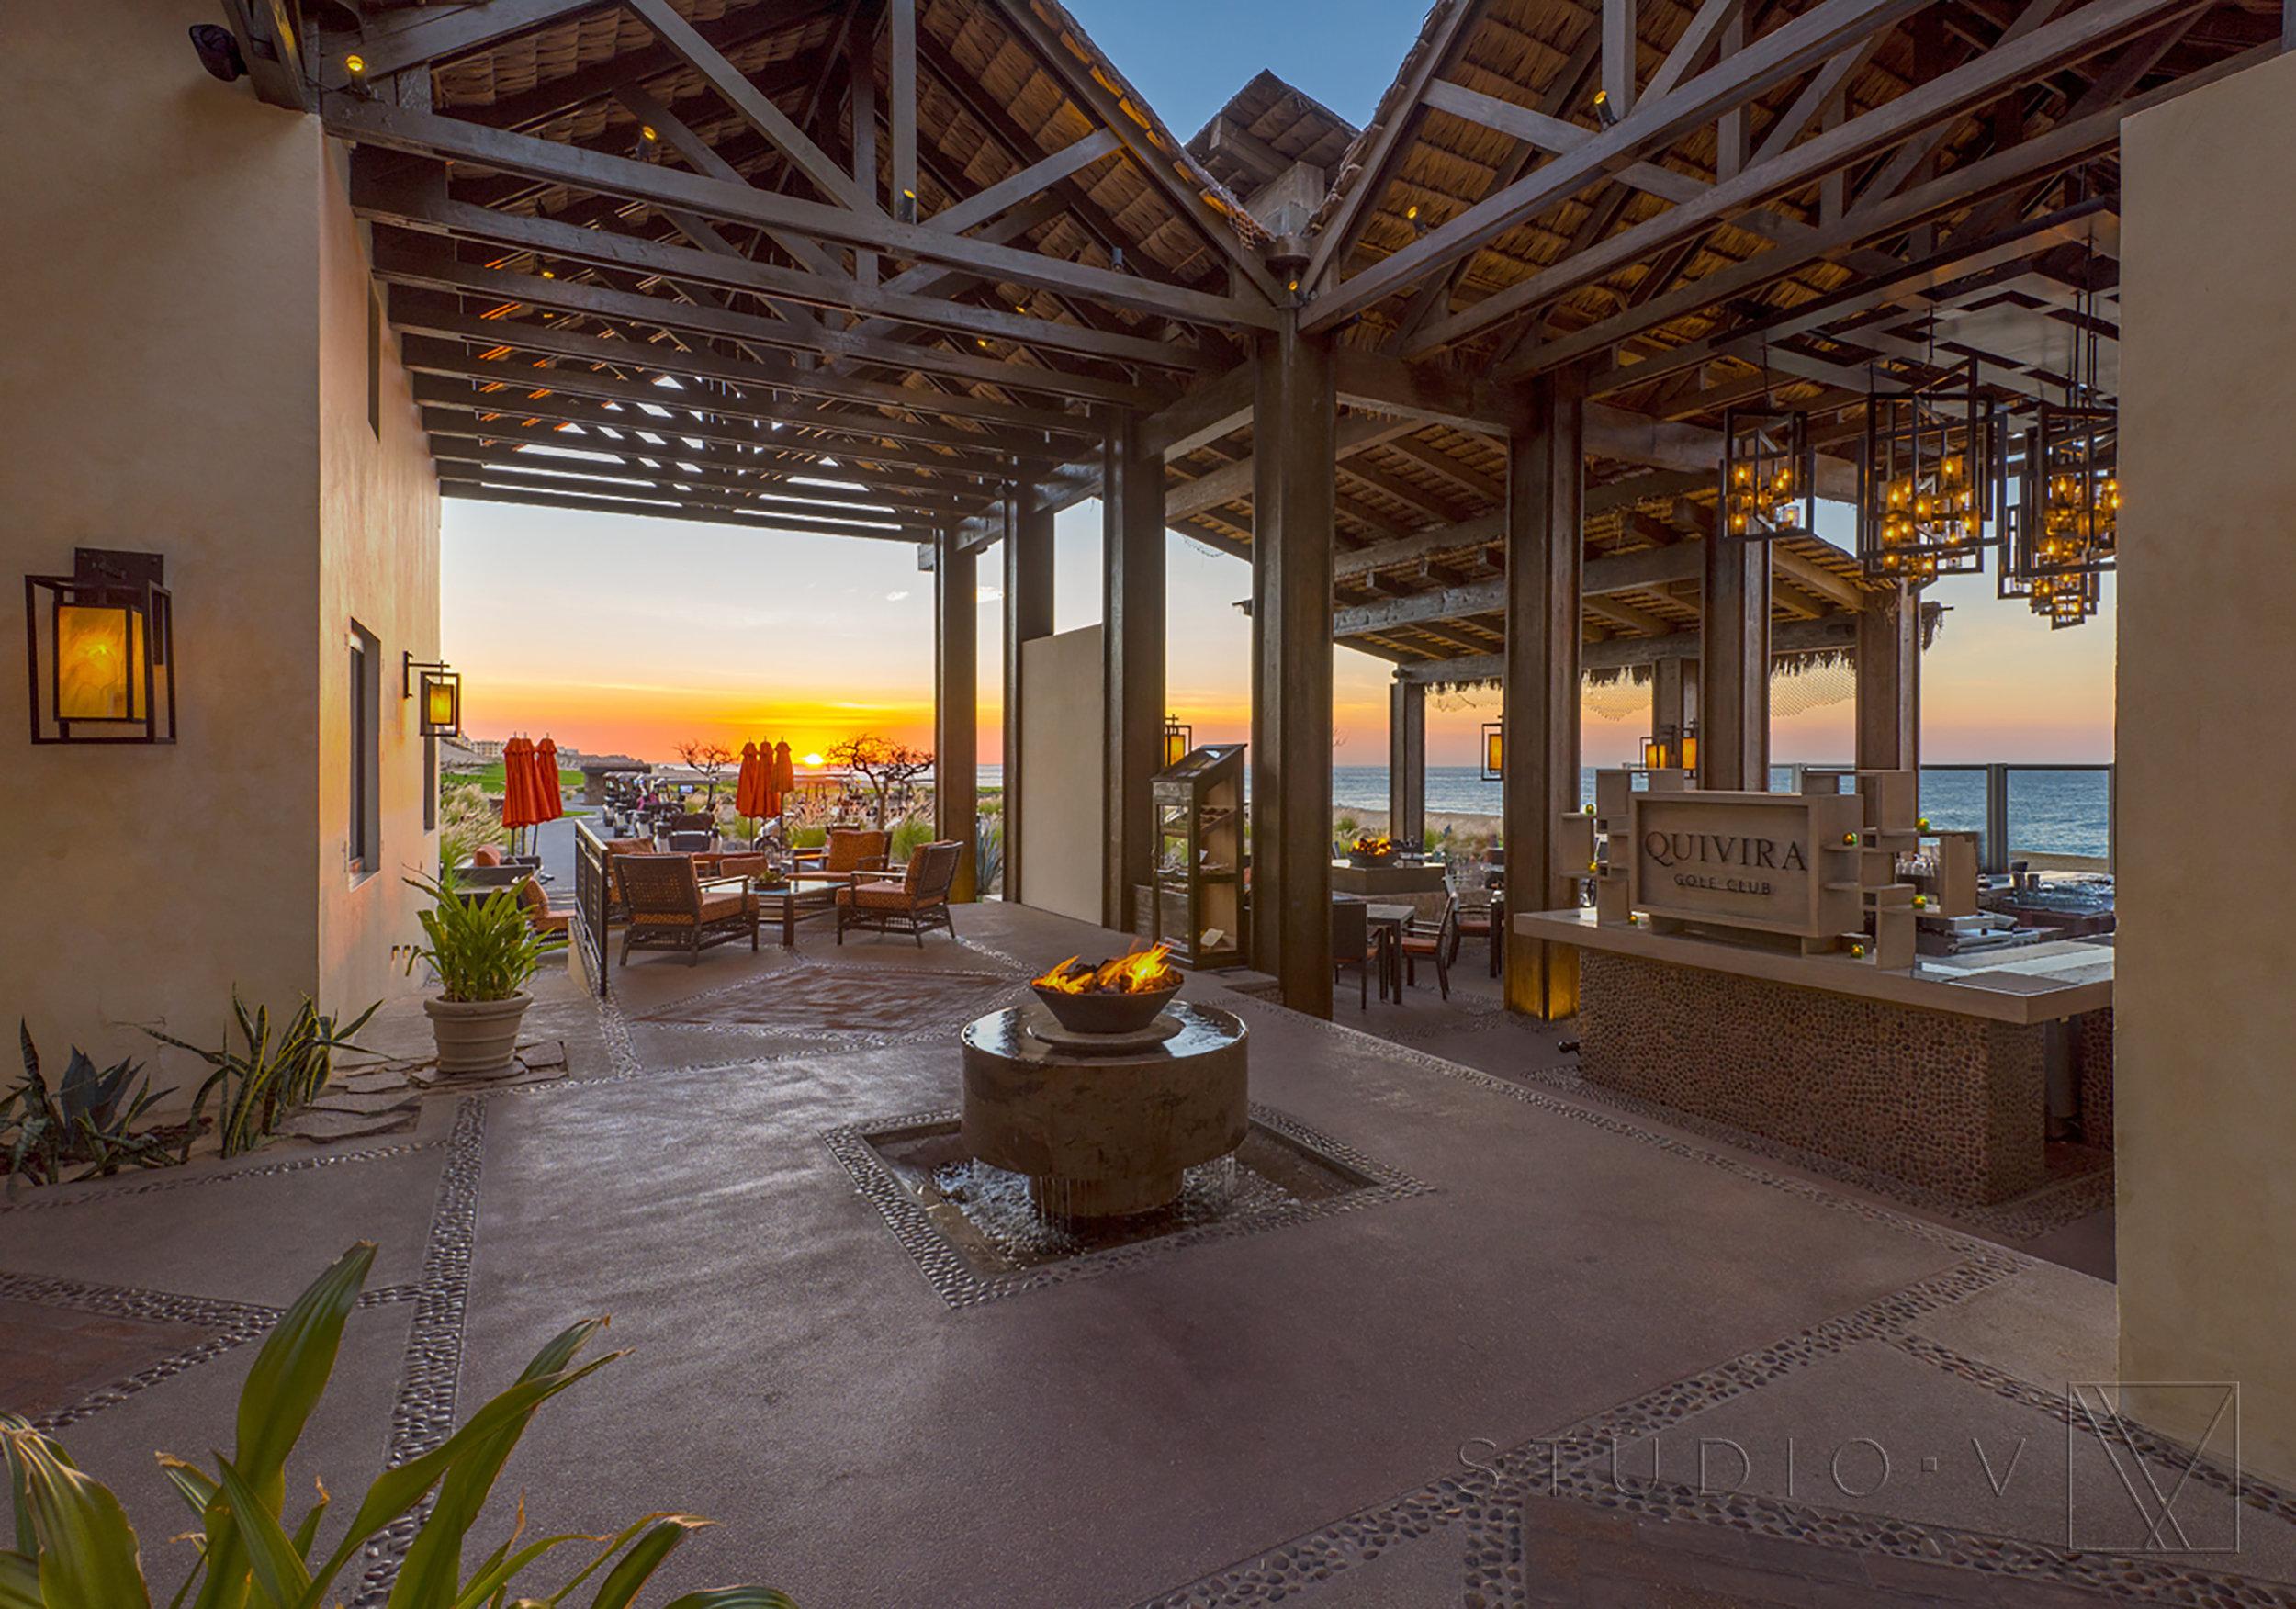 Quivira Clubhouse Sunset Beach Cabo San Lucas Studio V Interior Architecture and Design Scottsdale Arizona AZ (16).jpg